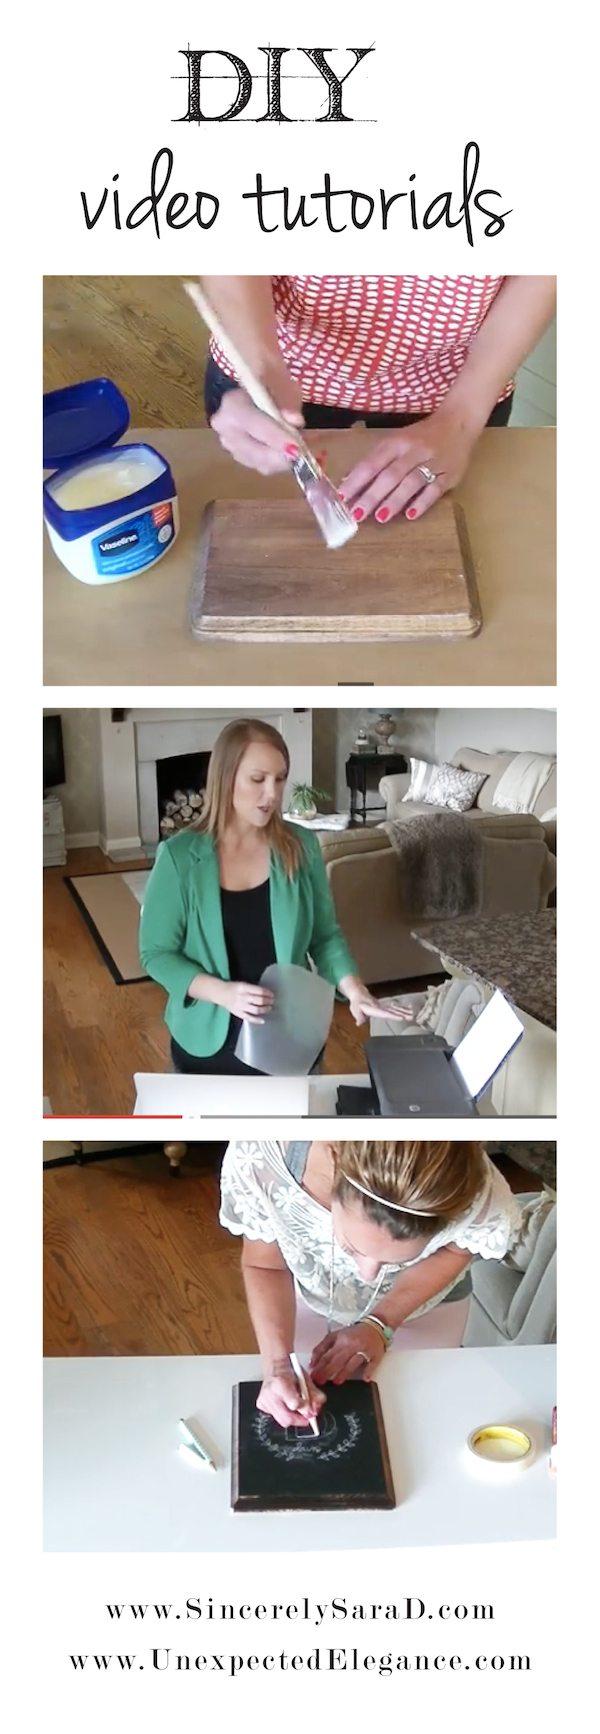 DIY Video Tutorials on YouTube